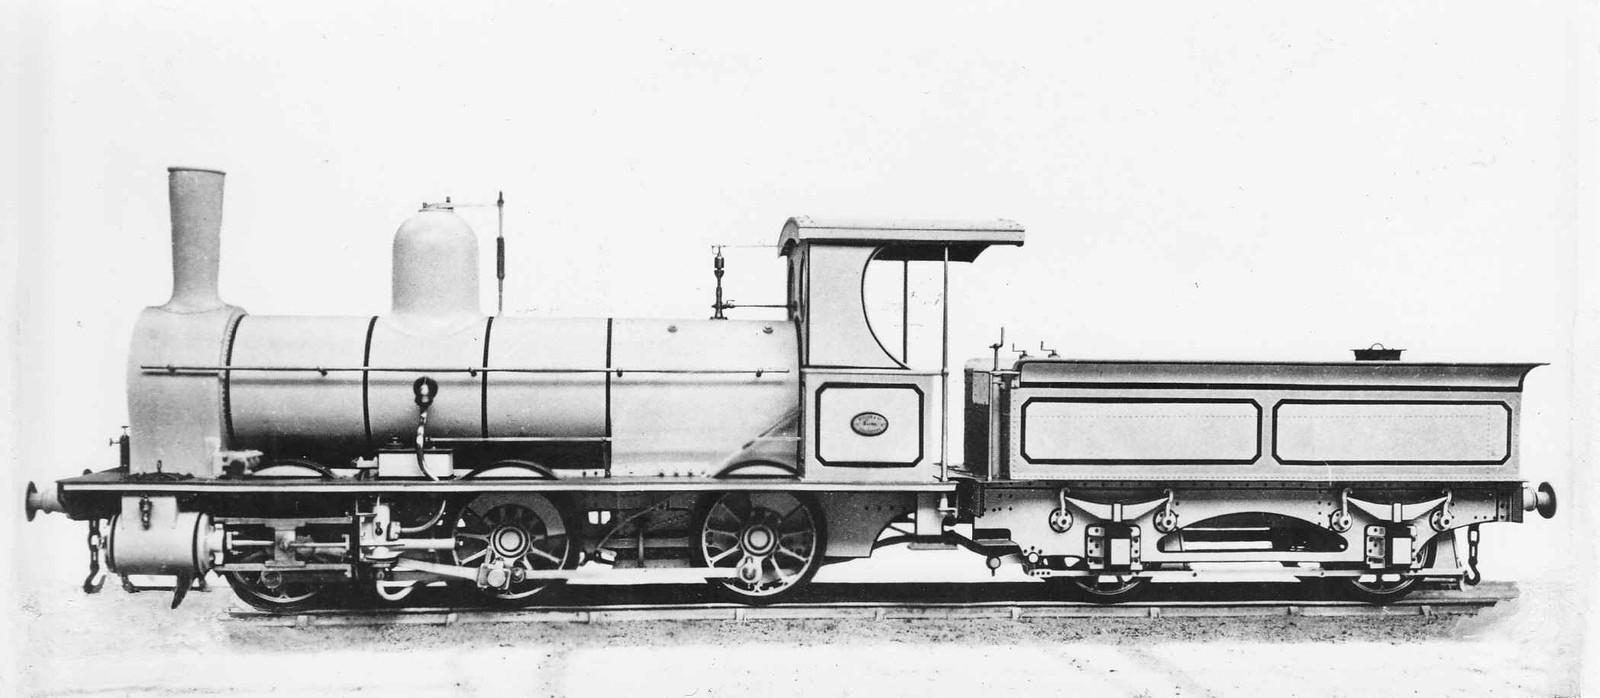 191419171720l